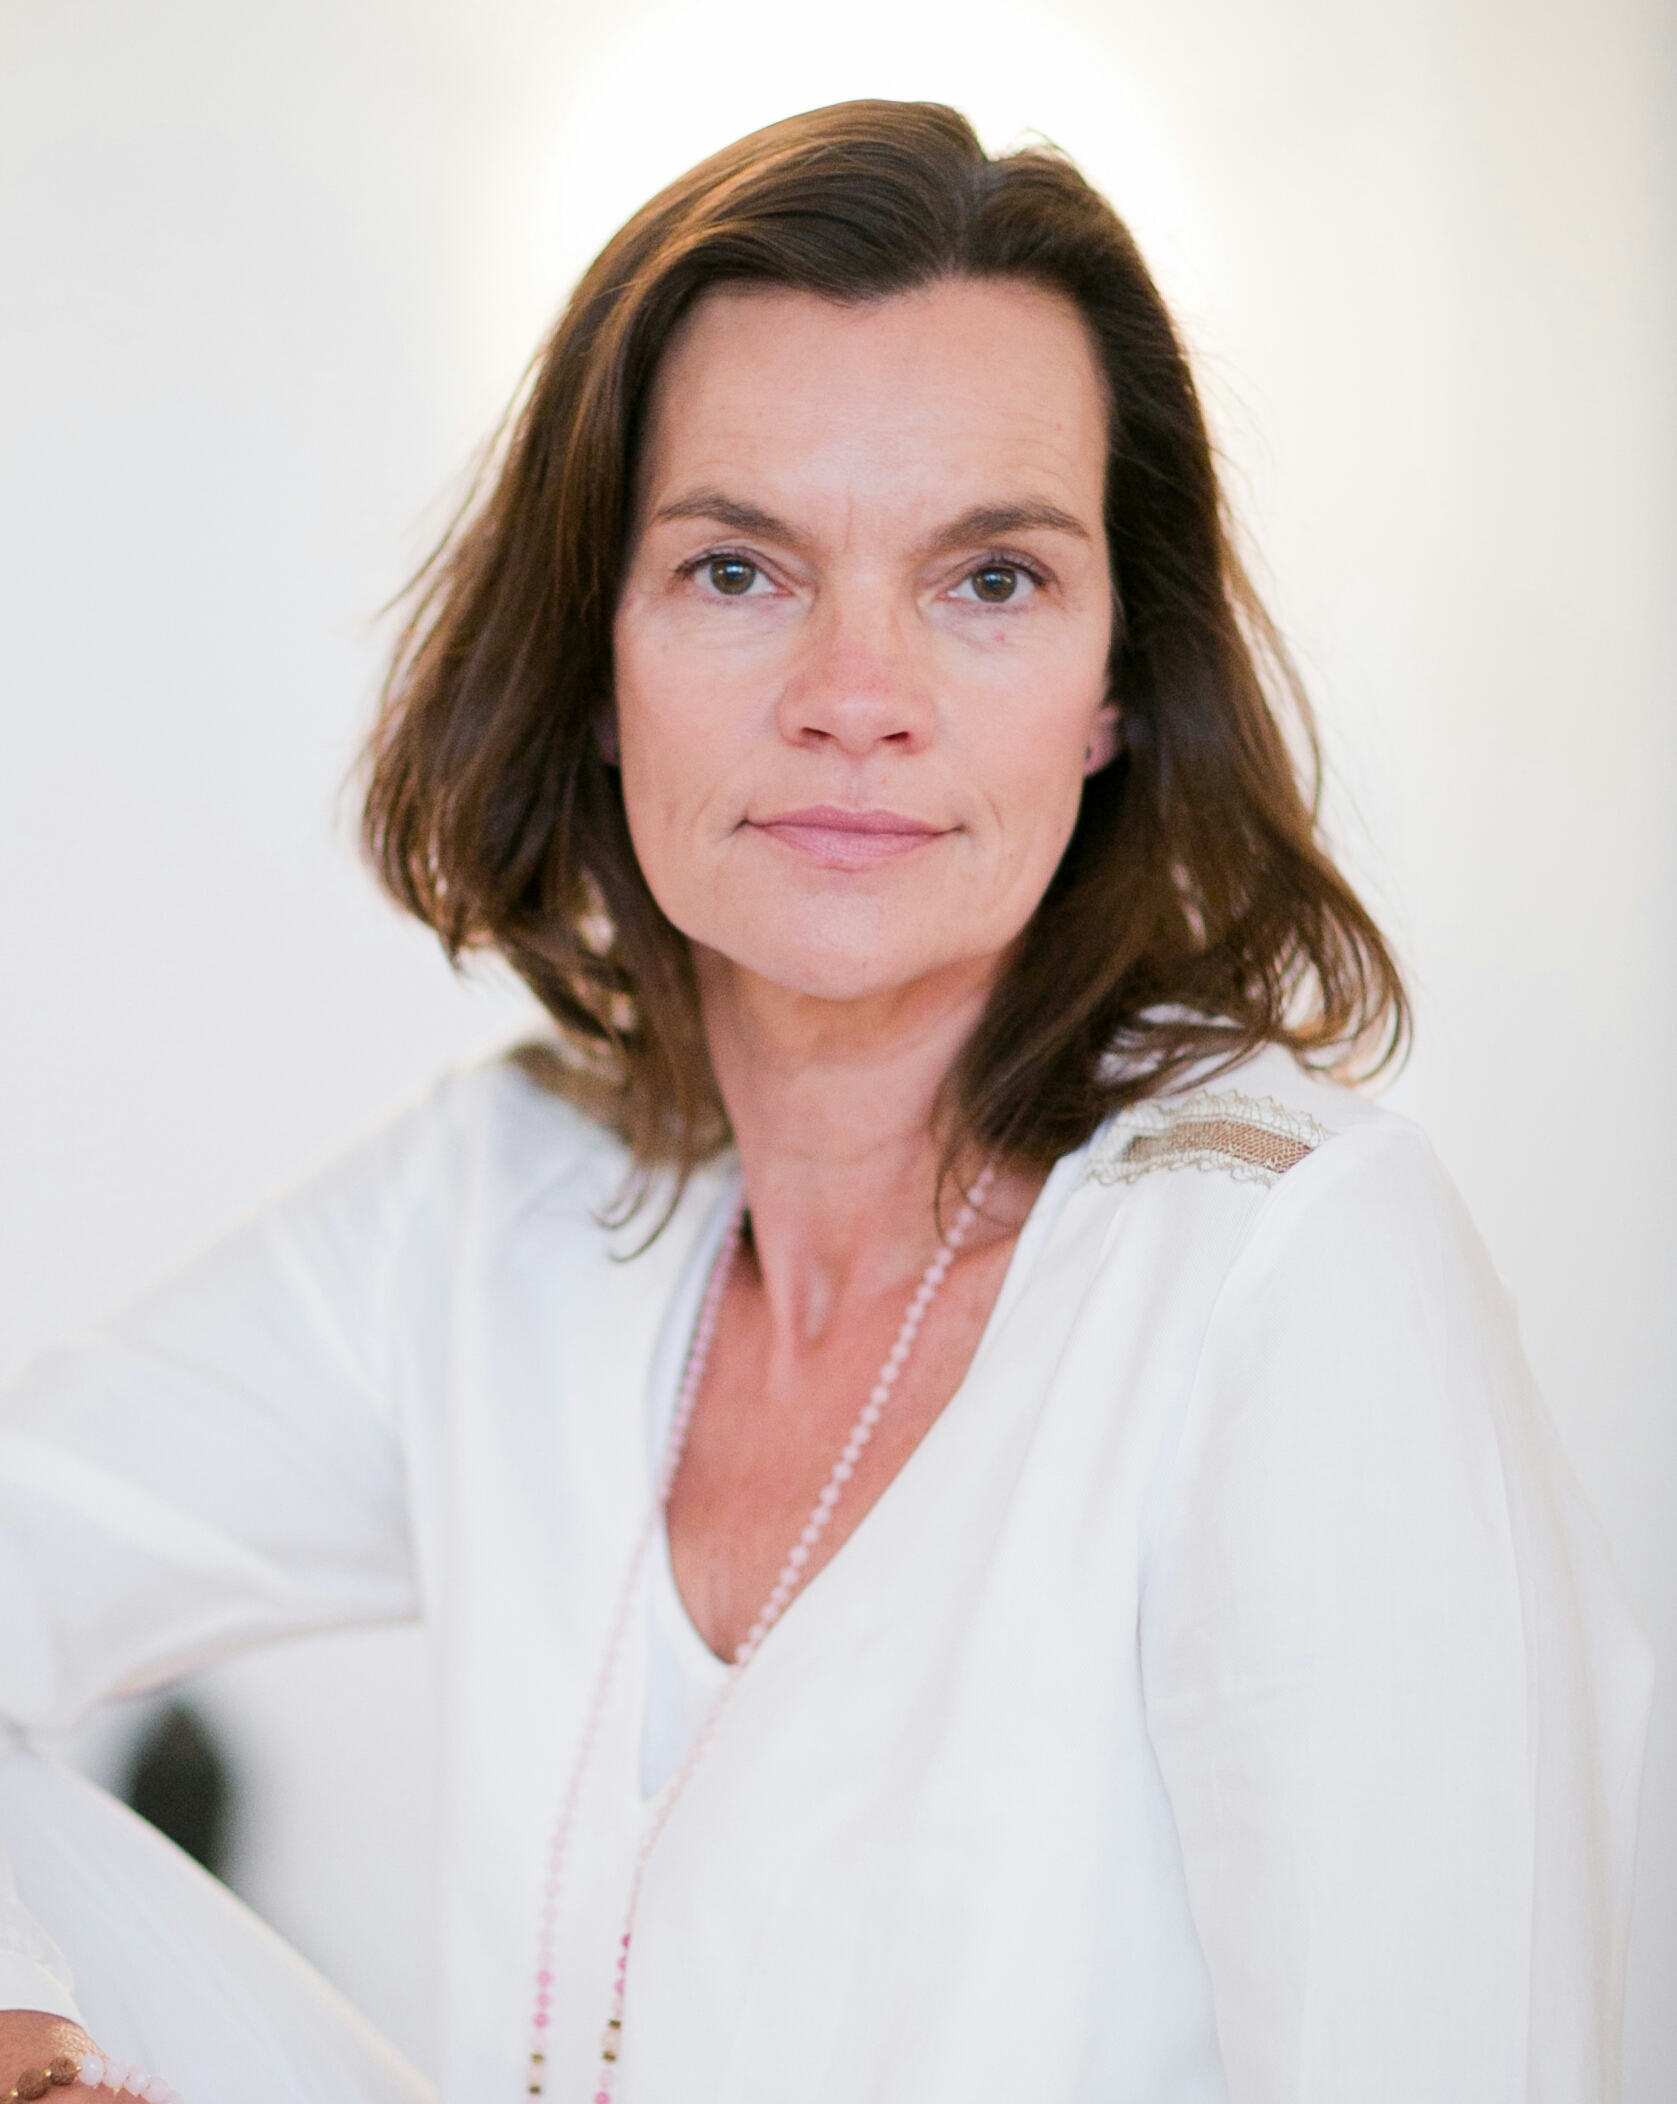 Martina Nirbhao Kaur Krüger